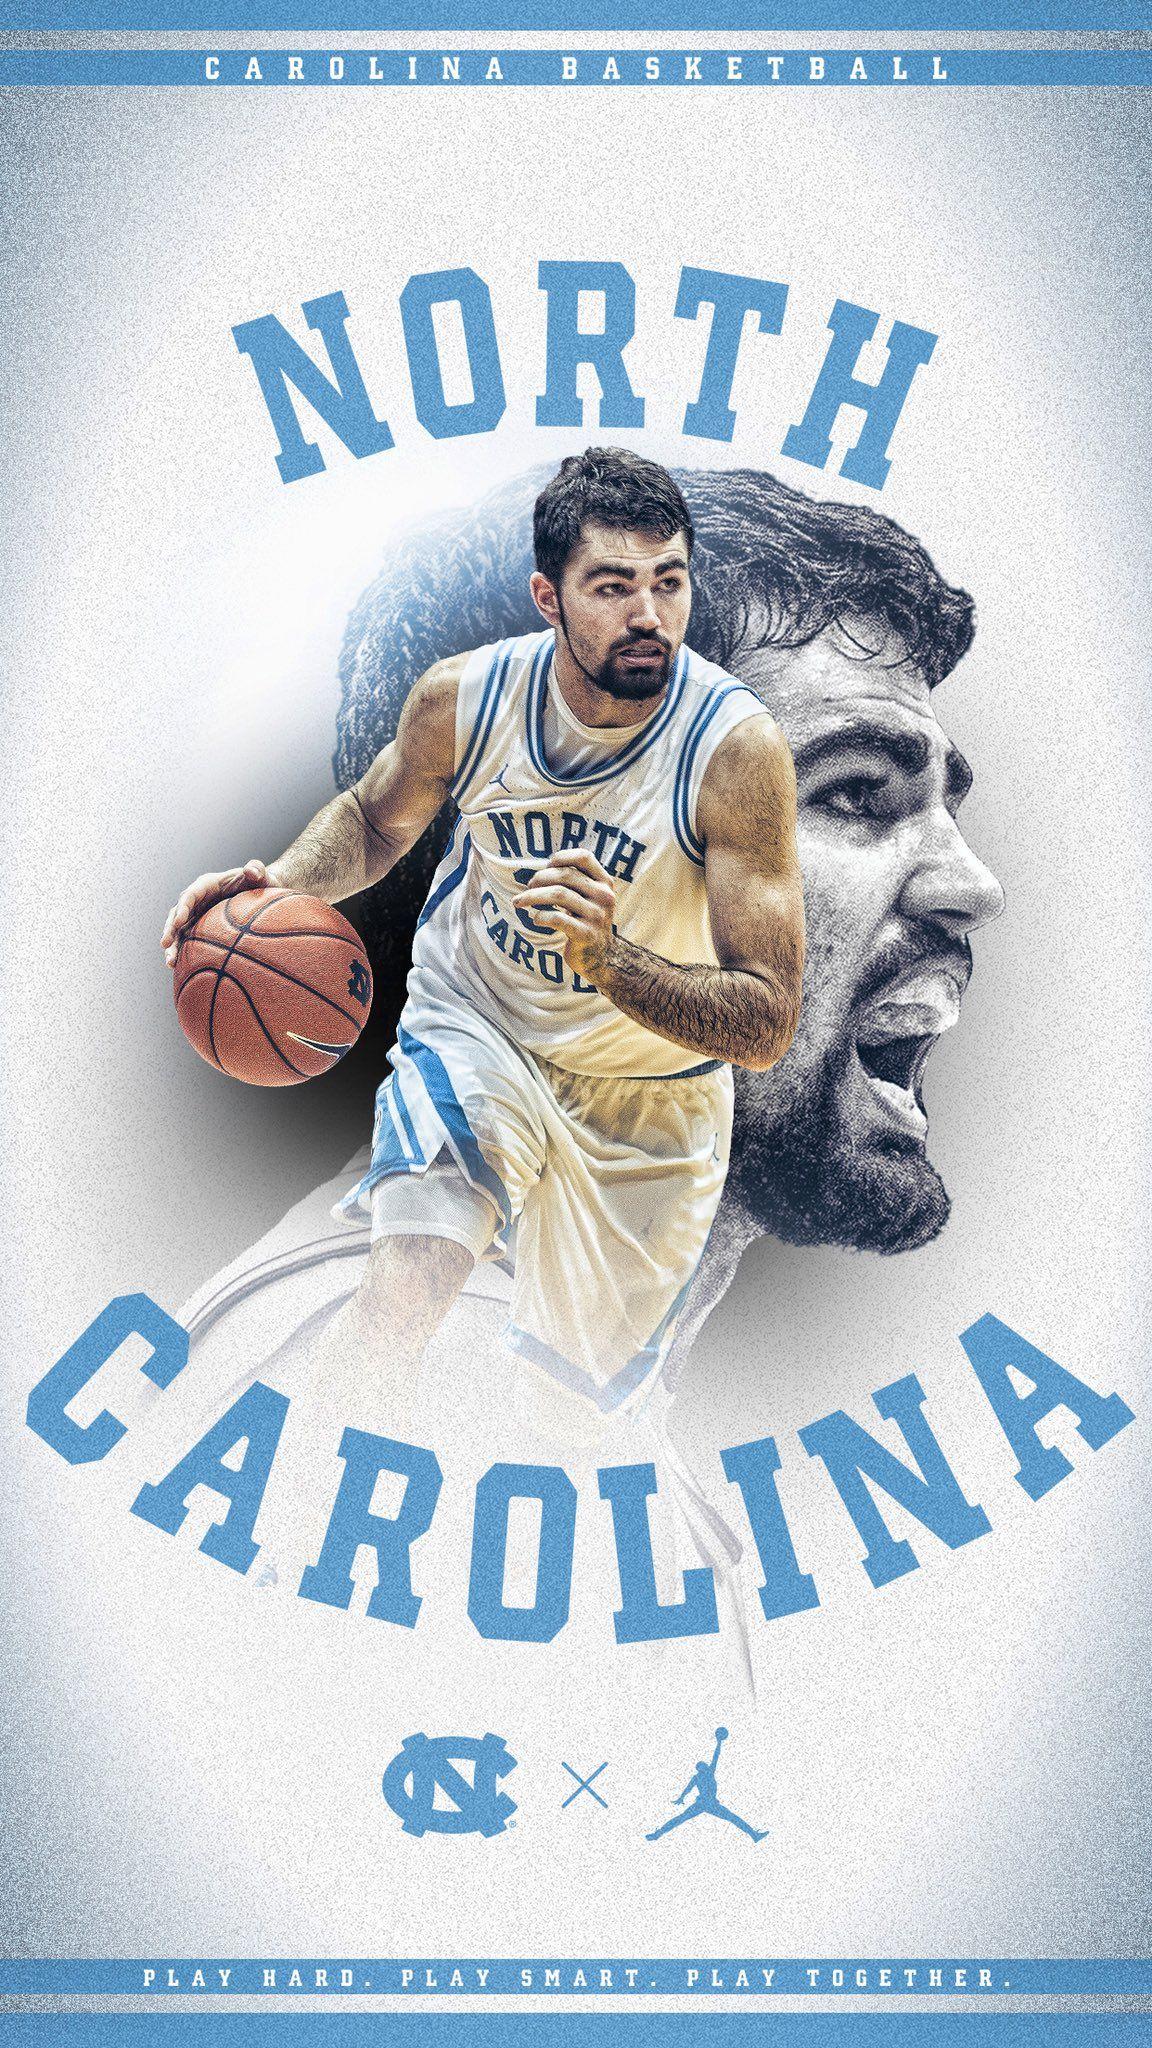 2ba9d93253c3 Carolina Basketball on Twitter